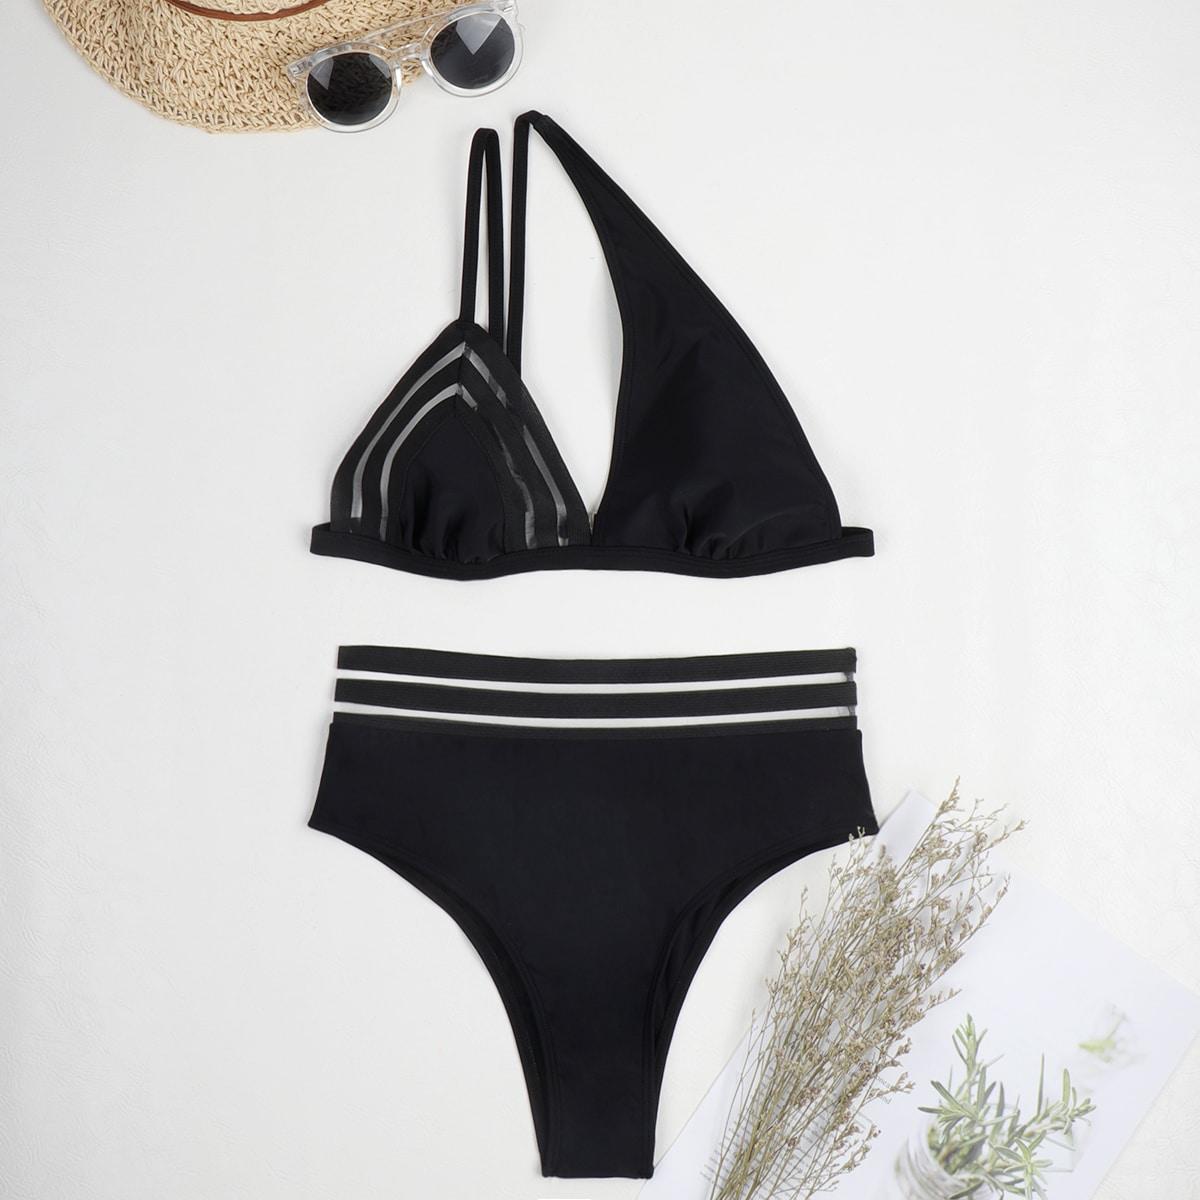 SHEIN / Mesh Trim Cut-out One Shoulder Bikini Swimsuit